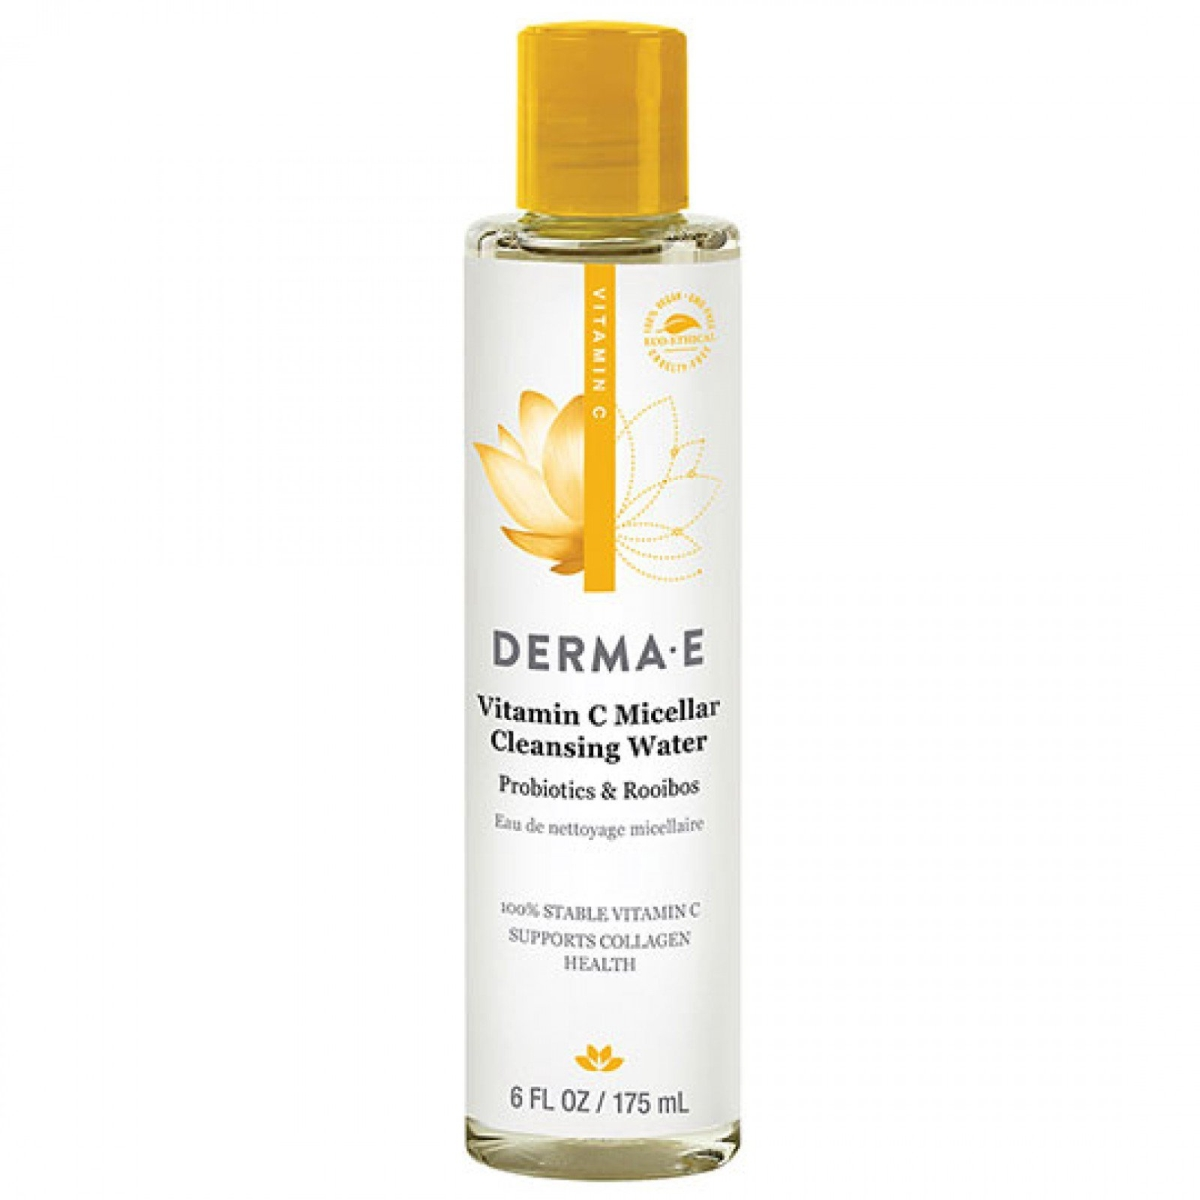 Frontier 231497 6 fl oz Derma E Vitamin C Micellar Cleansing Water